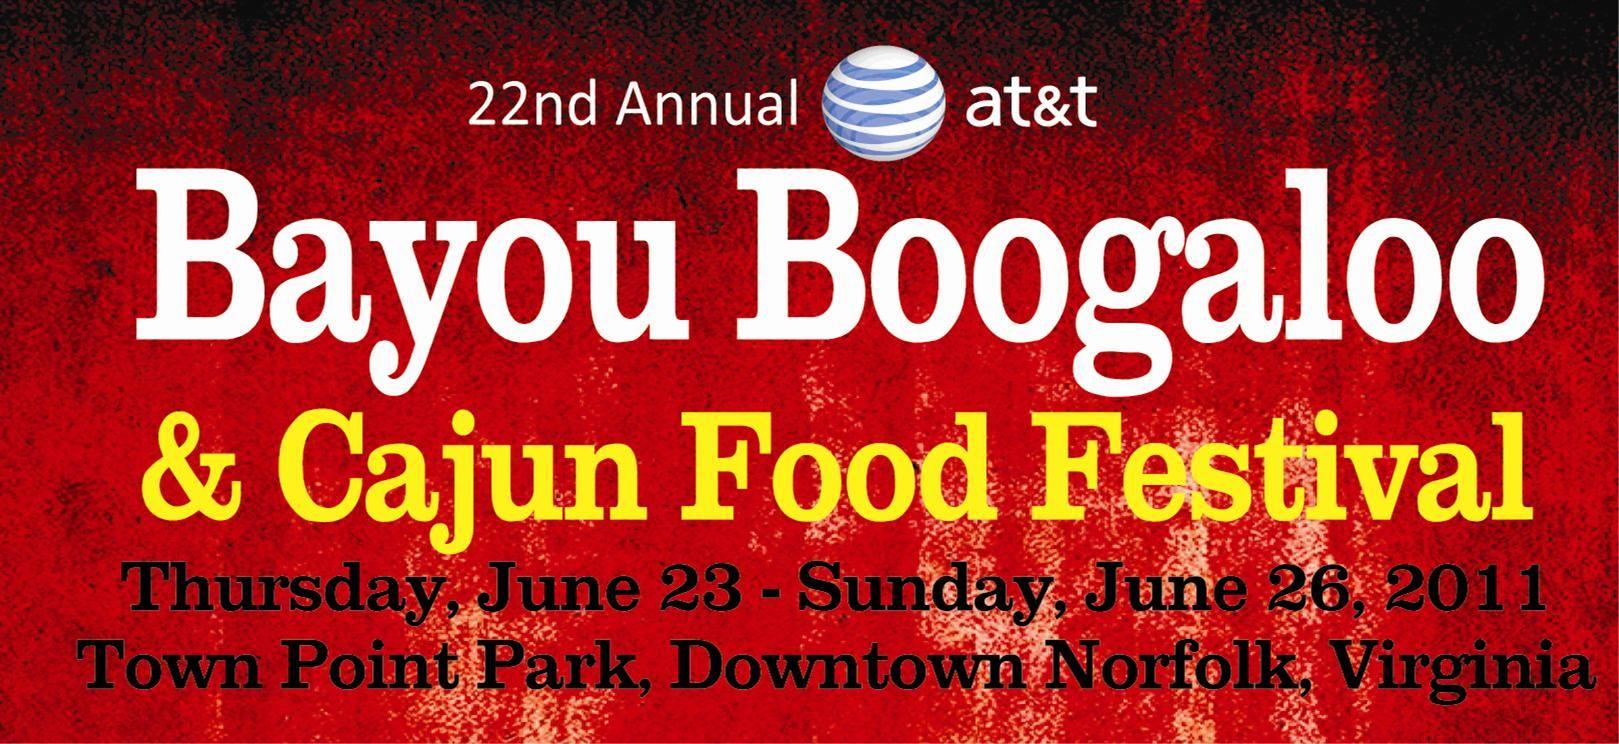 Cajun food festivalnorfolk va food festival cajun